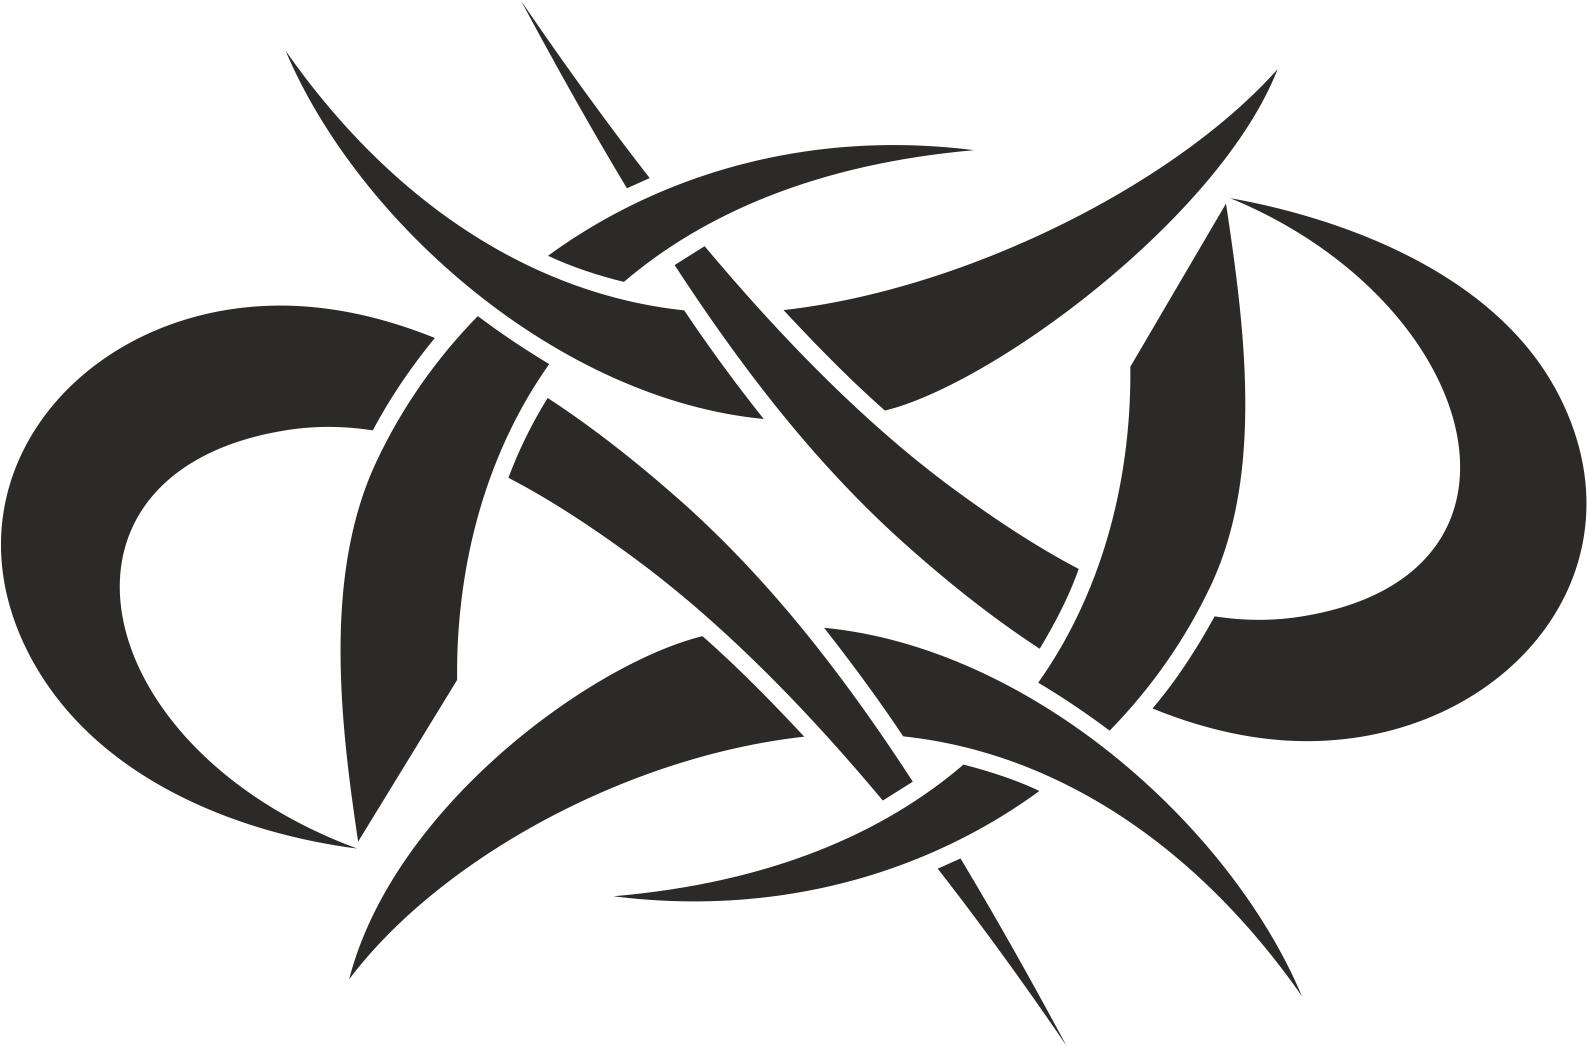 Abstract Tattoo Tribal Design Free CDR Vectors Art